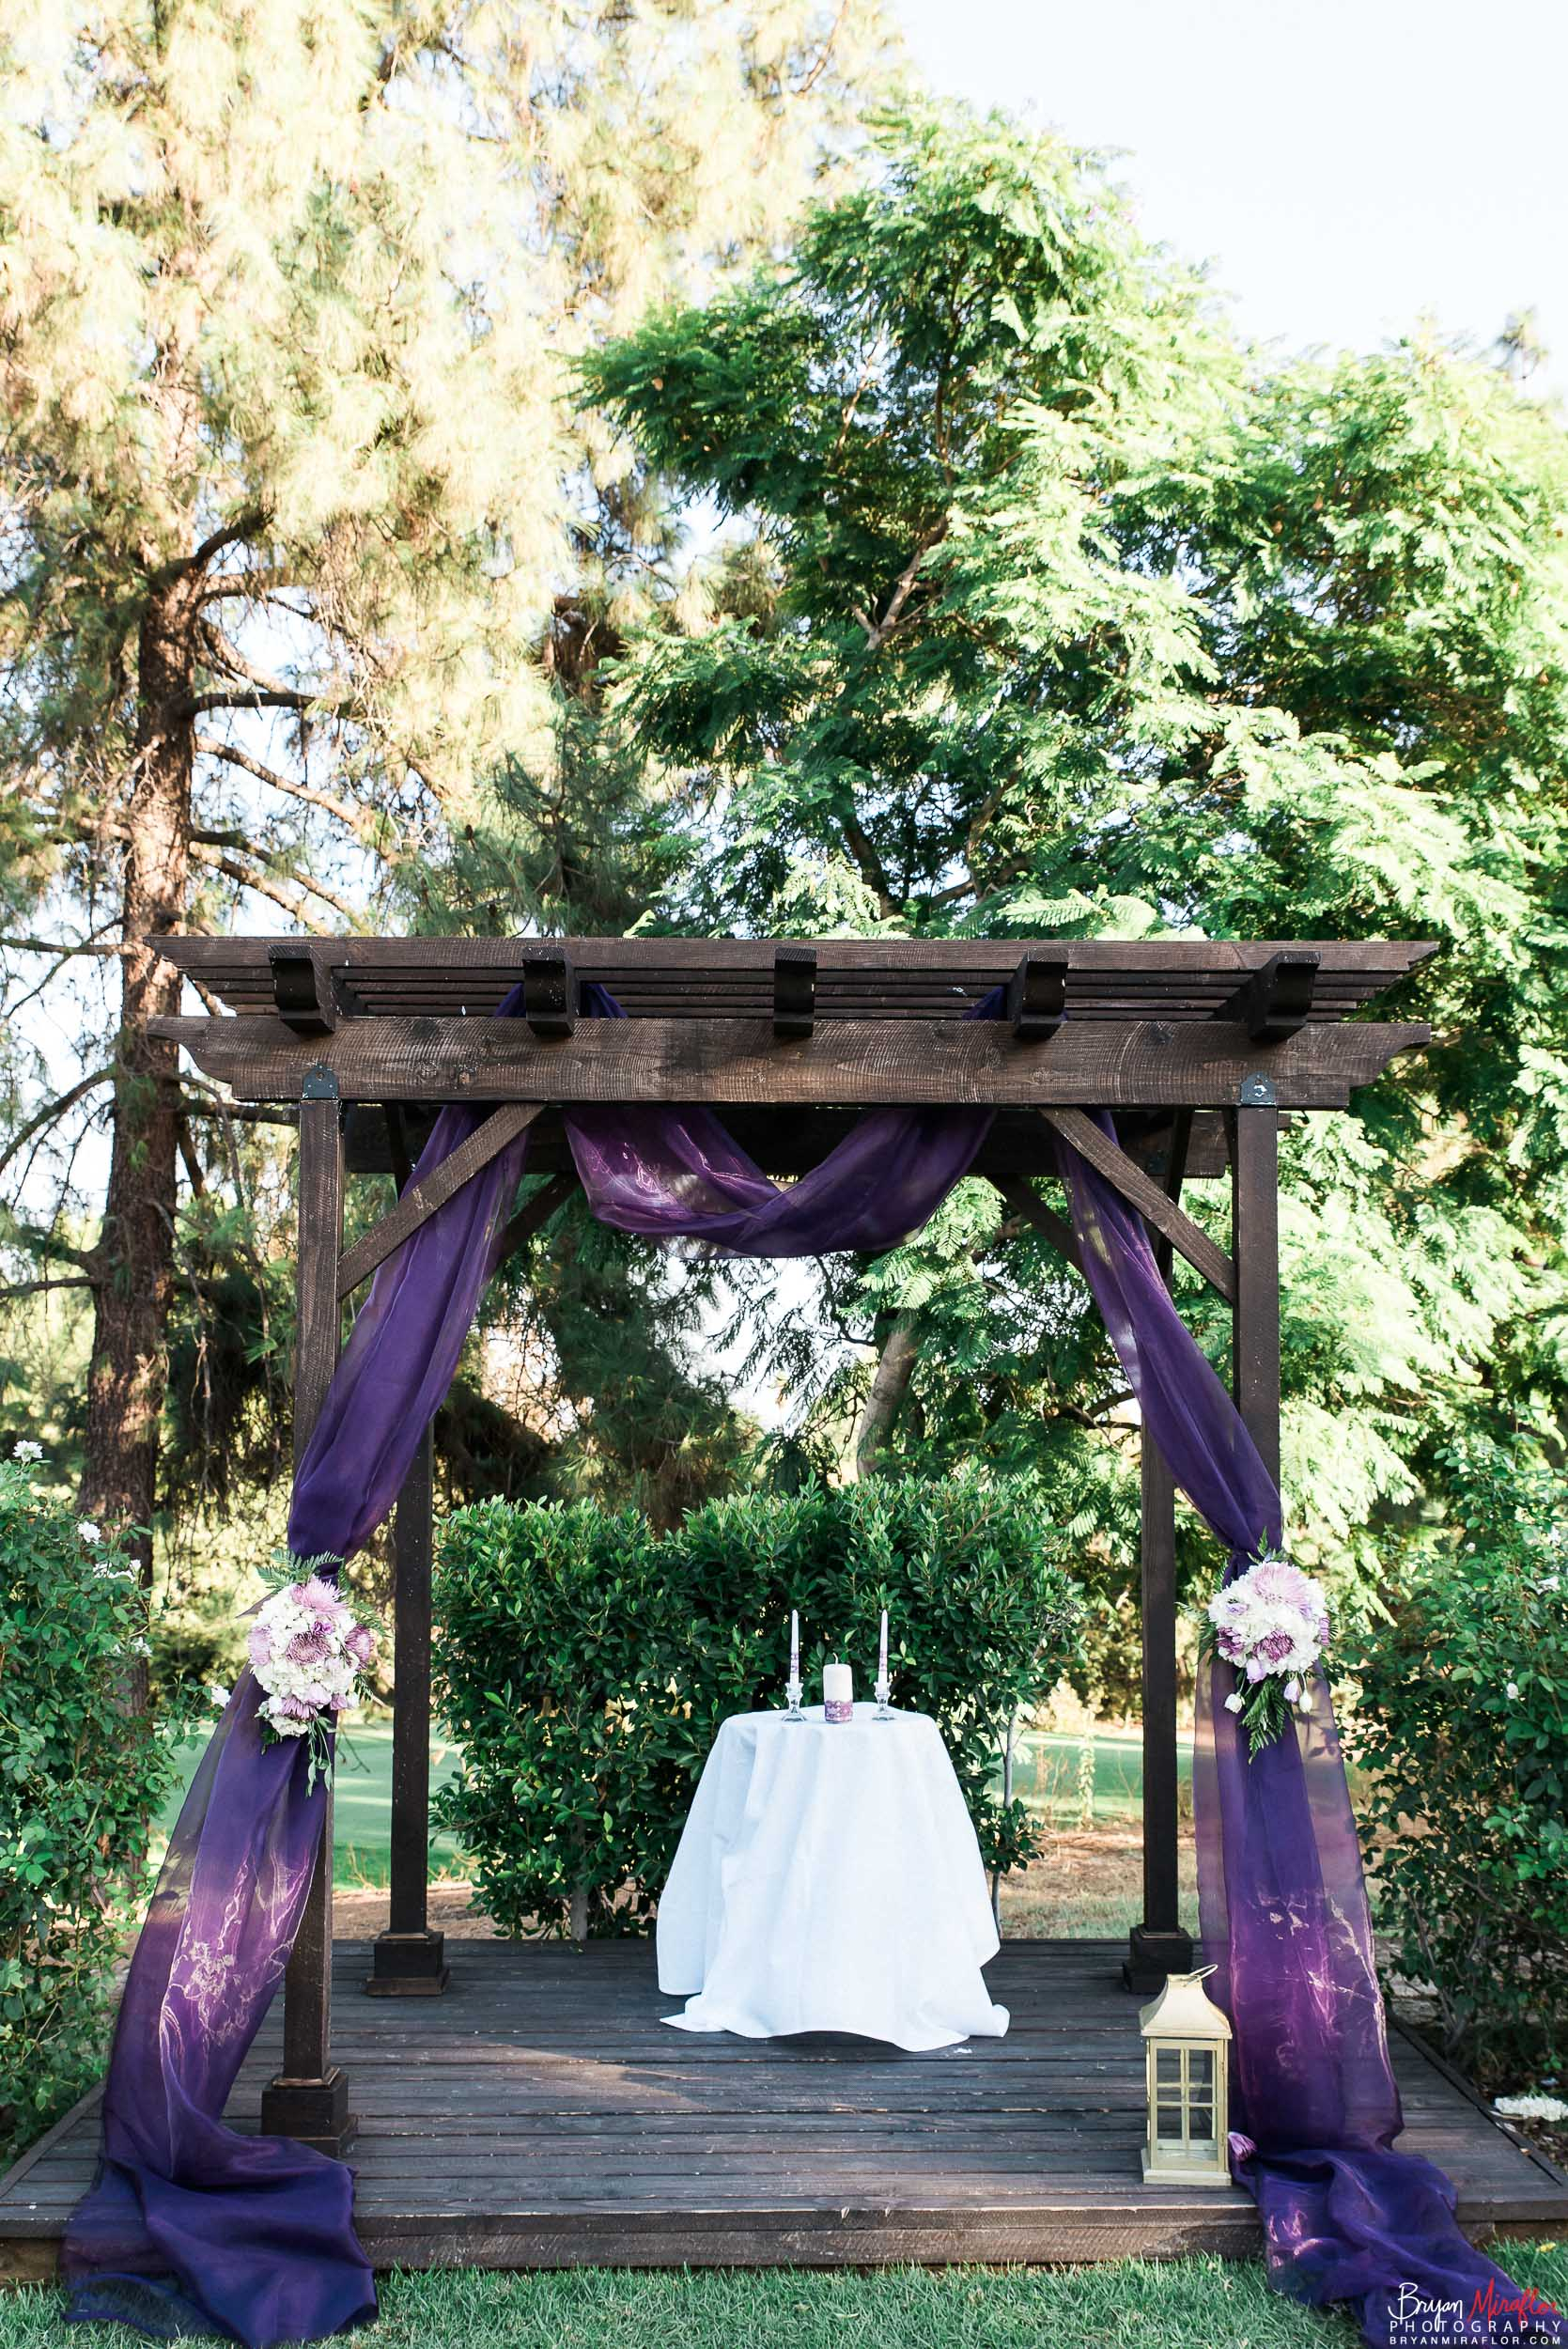 Bryan-Miraflor-Photography-Trisha-Dexter-Married-20170923-046.jpg